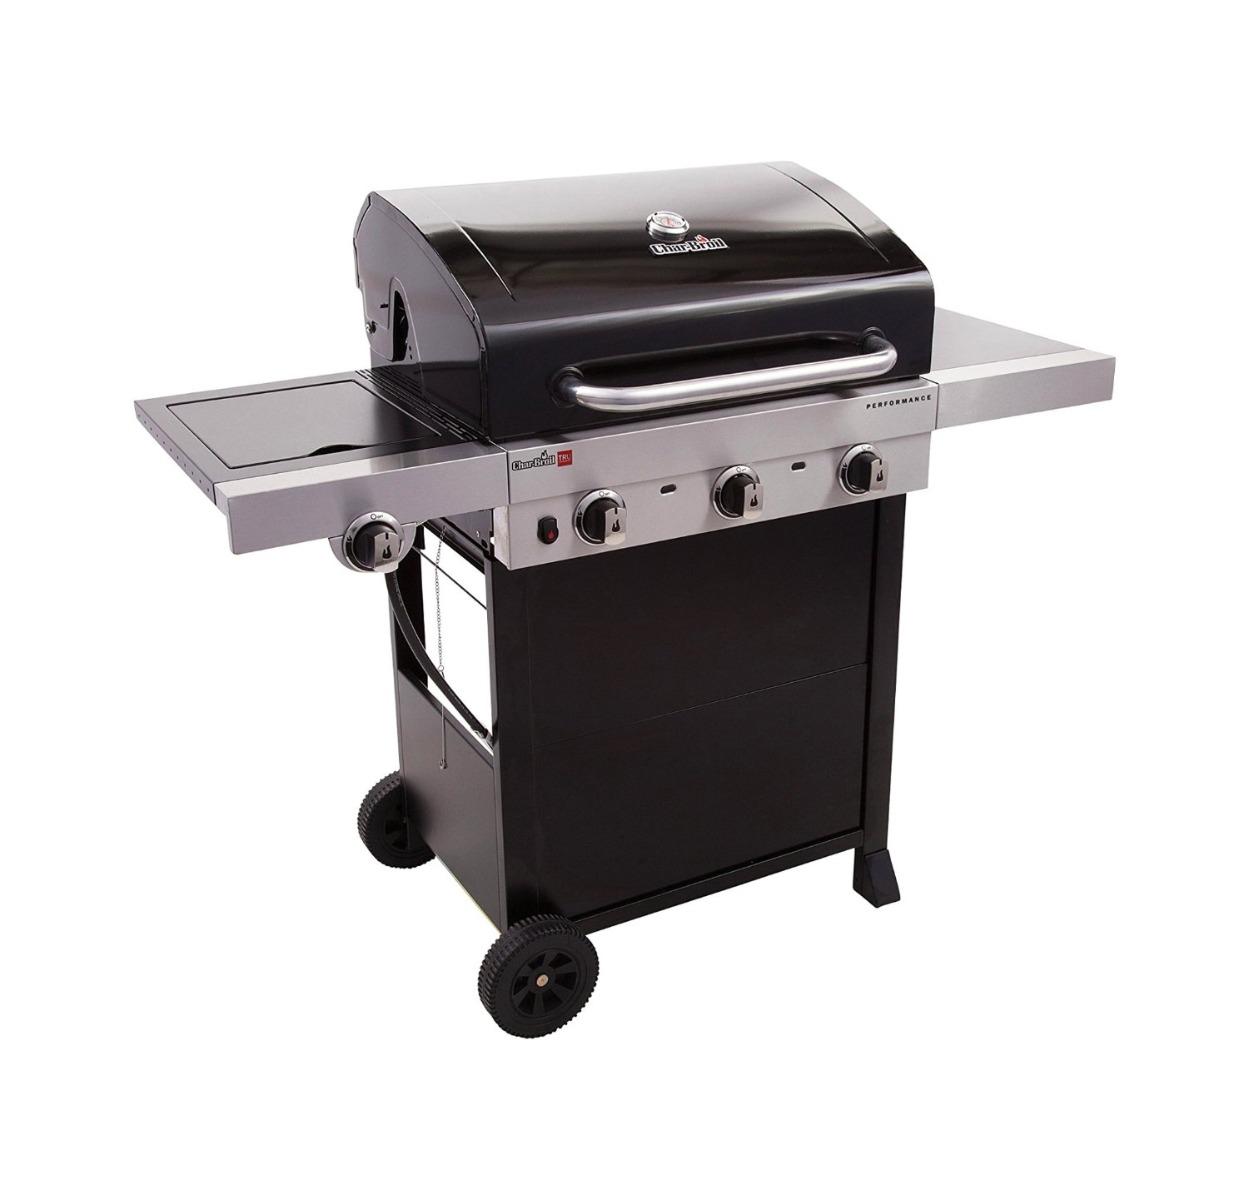 Char-Broil 3-Burner Cart Gas Grill (Black)